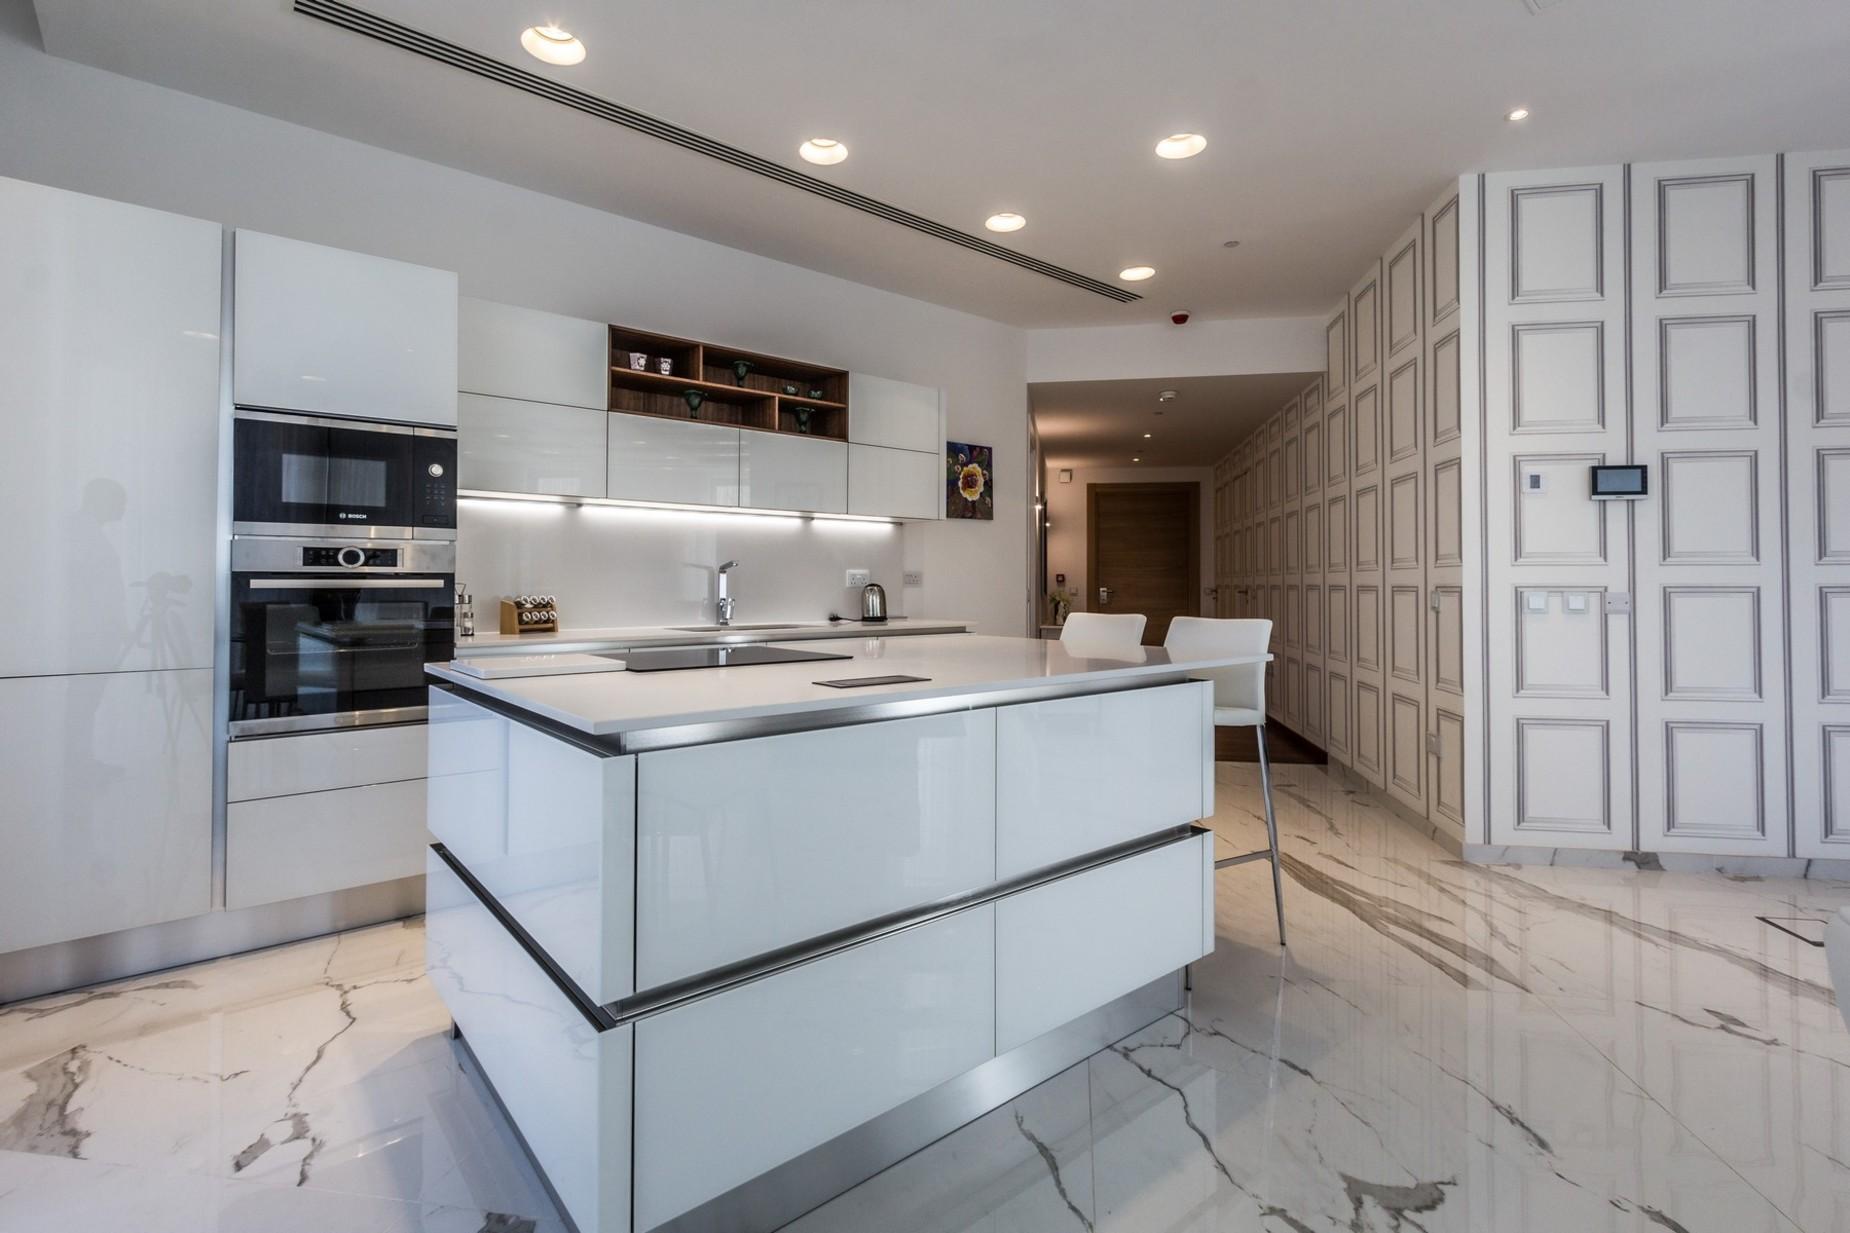 1 bed Apartment For Rent in Sliema, Sliema - thumb 5